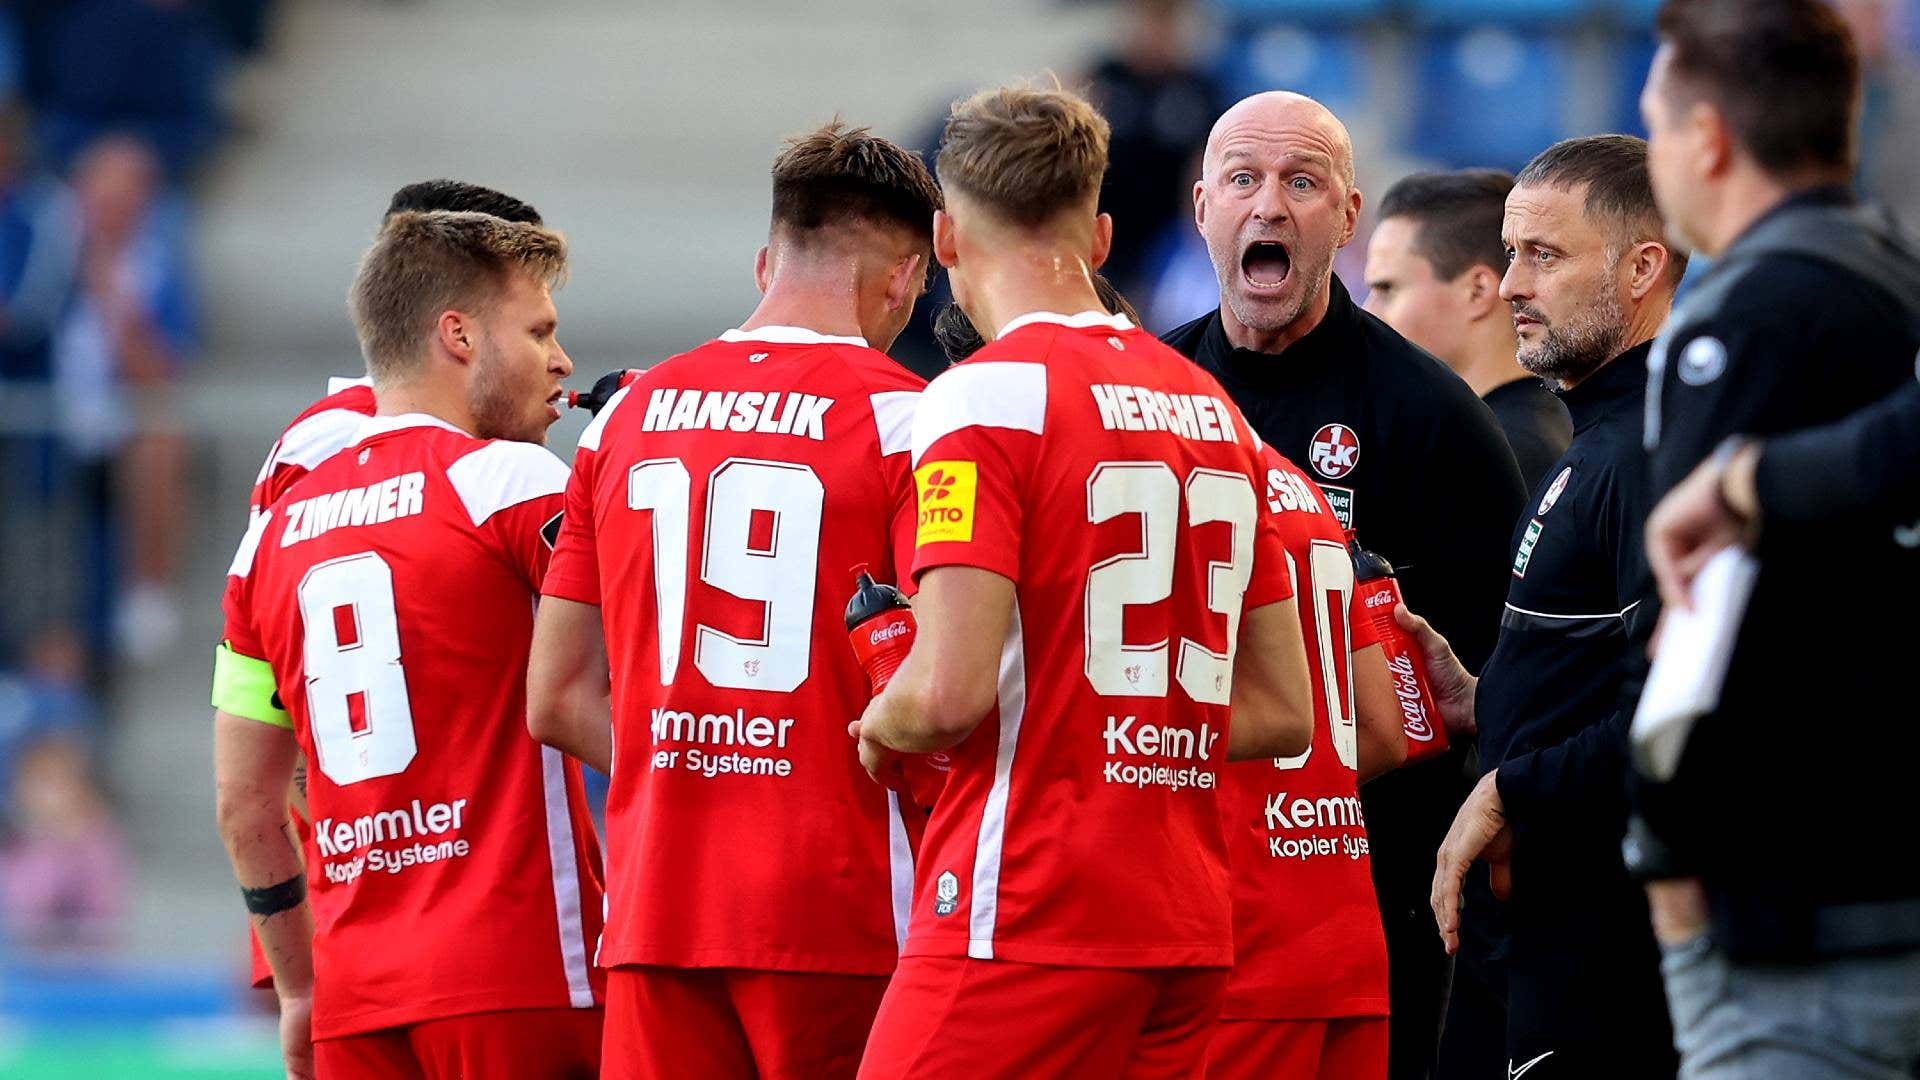 MSV Duisburg vs. 1. FC Kaiserslautern (FCK) heute live sehen: TV, LIVE-STREAM, TICKER - wer zeigt die 3. Liga am Montag? | Goal.com